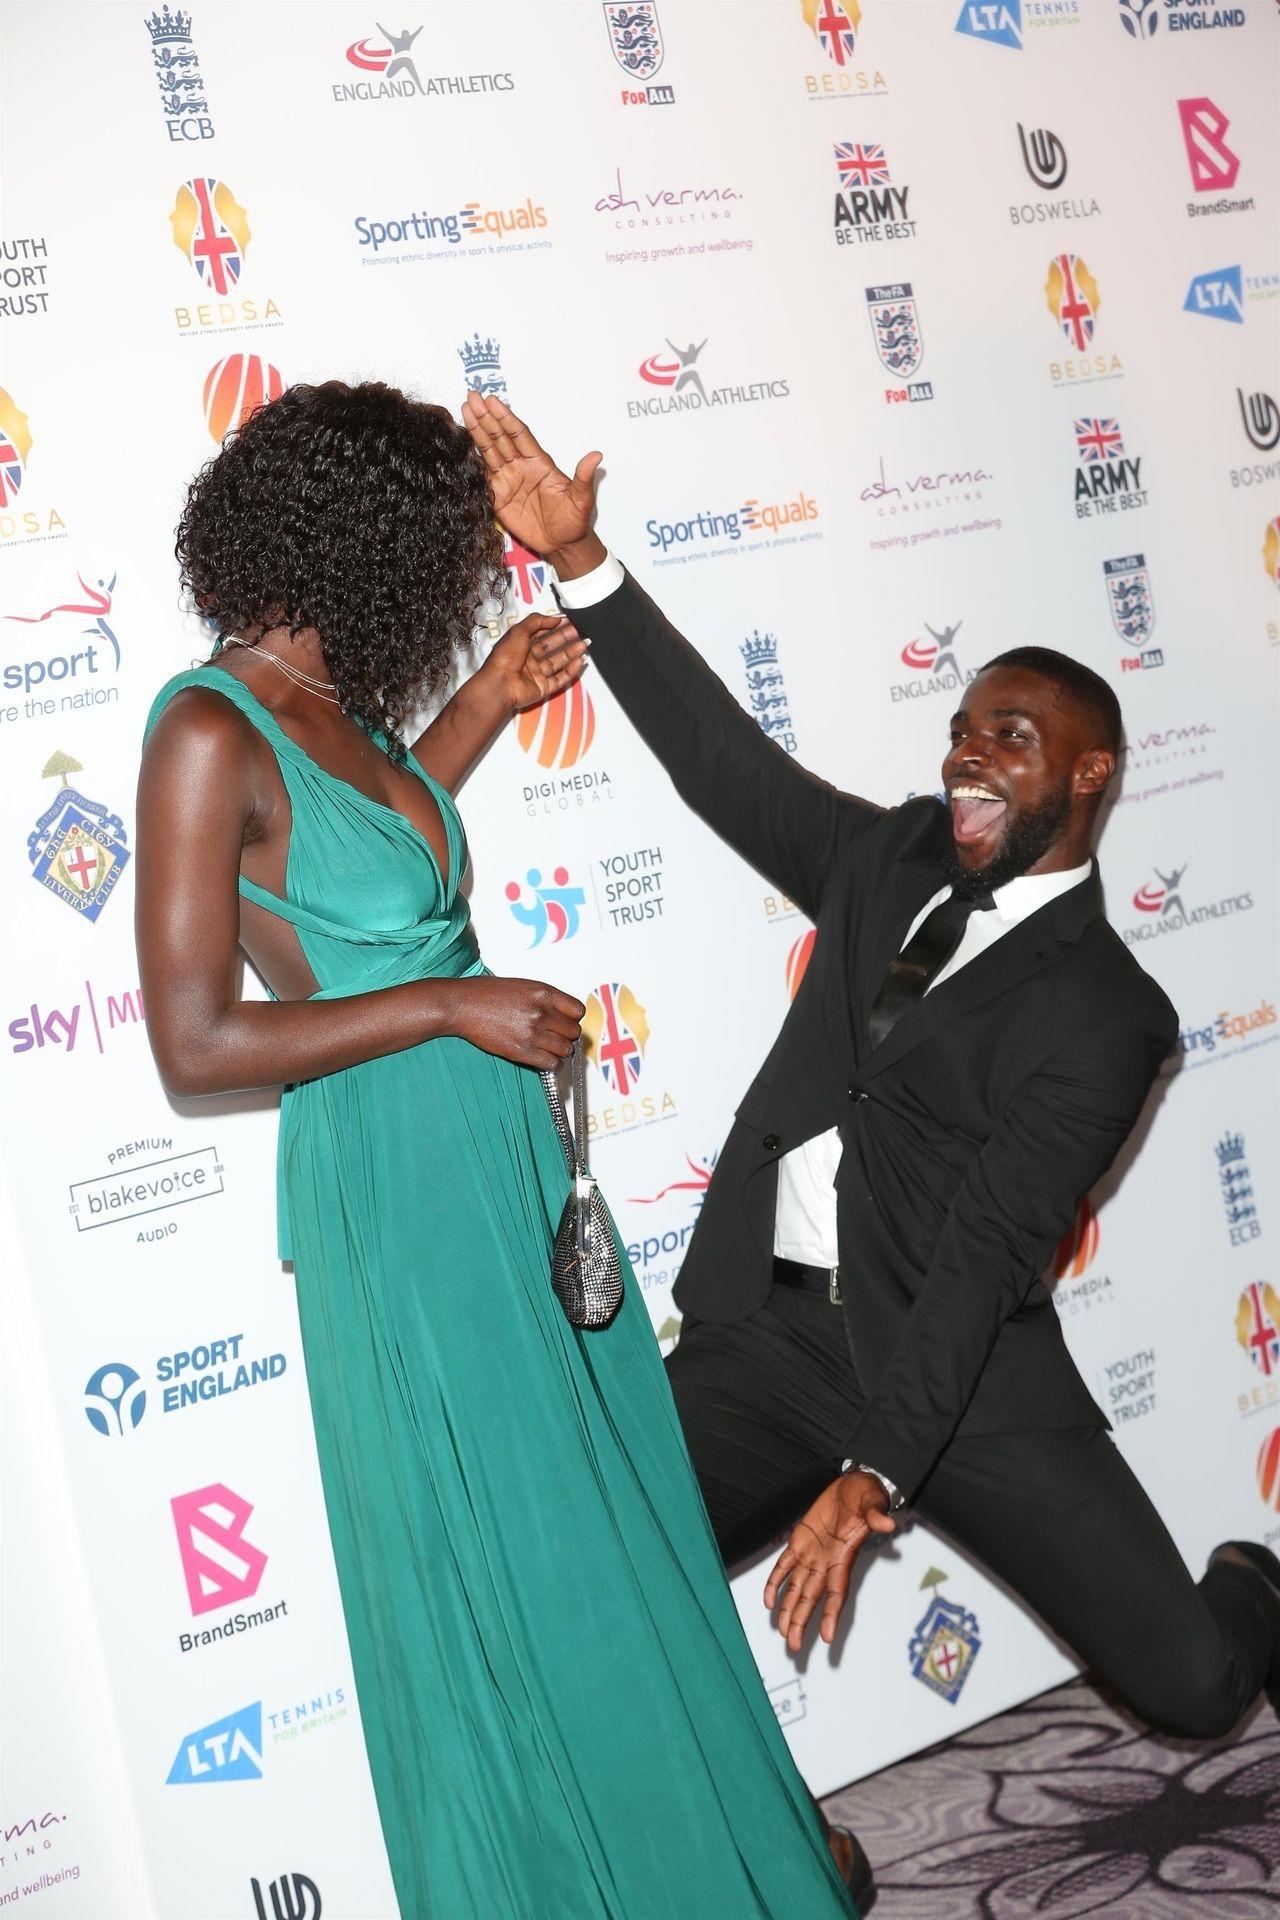 Mike Boateng & Priscilla Anyabu Are Seen At British Ethnic Diversity Sports Awards 0032